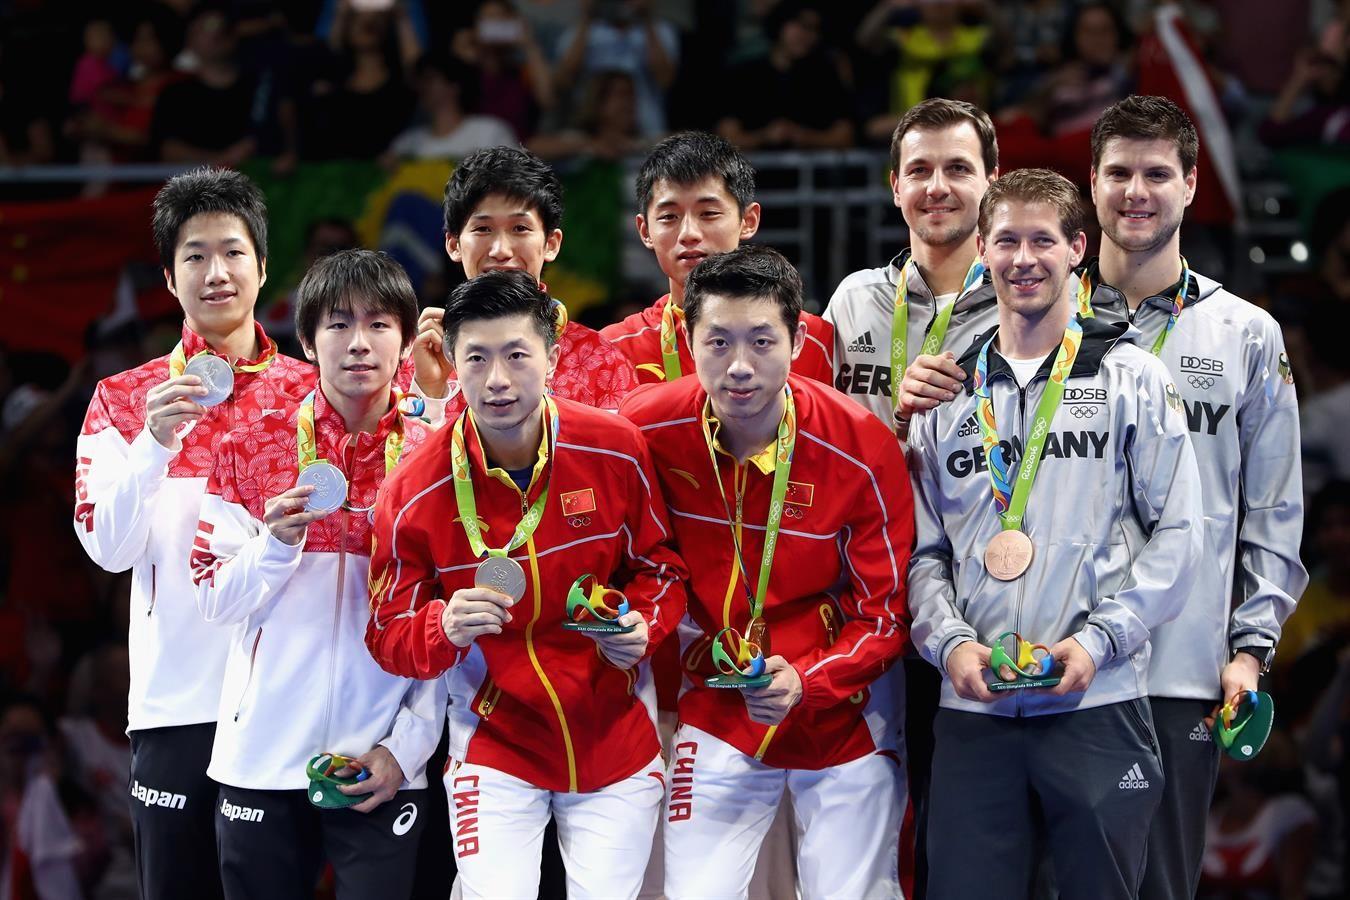 Medal Mizutani Jun Yoshimura Maharu Niwa Koki Ma Long Xu Xin Zhang Jike Boll Timo Ovtcharov Dimitri Table Tennis Olympic Table Tennis Olympics